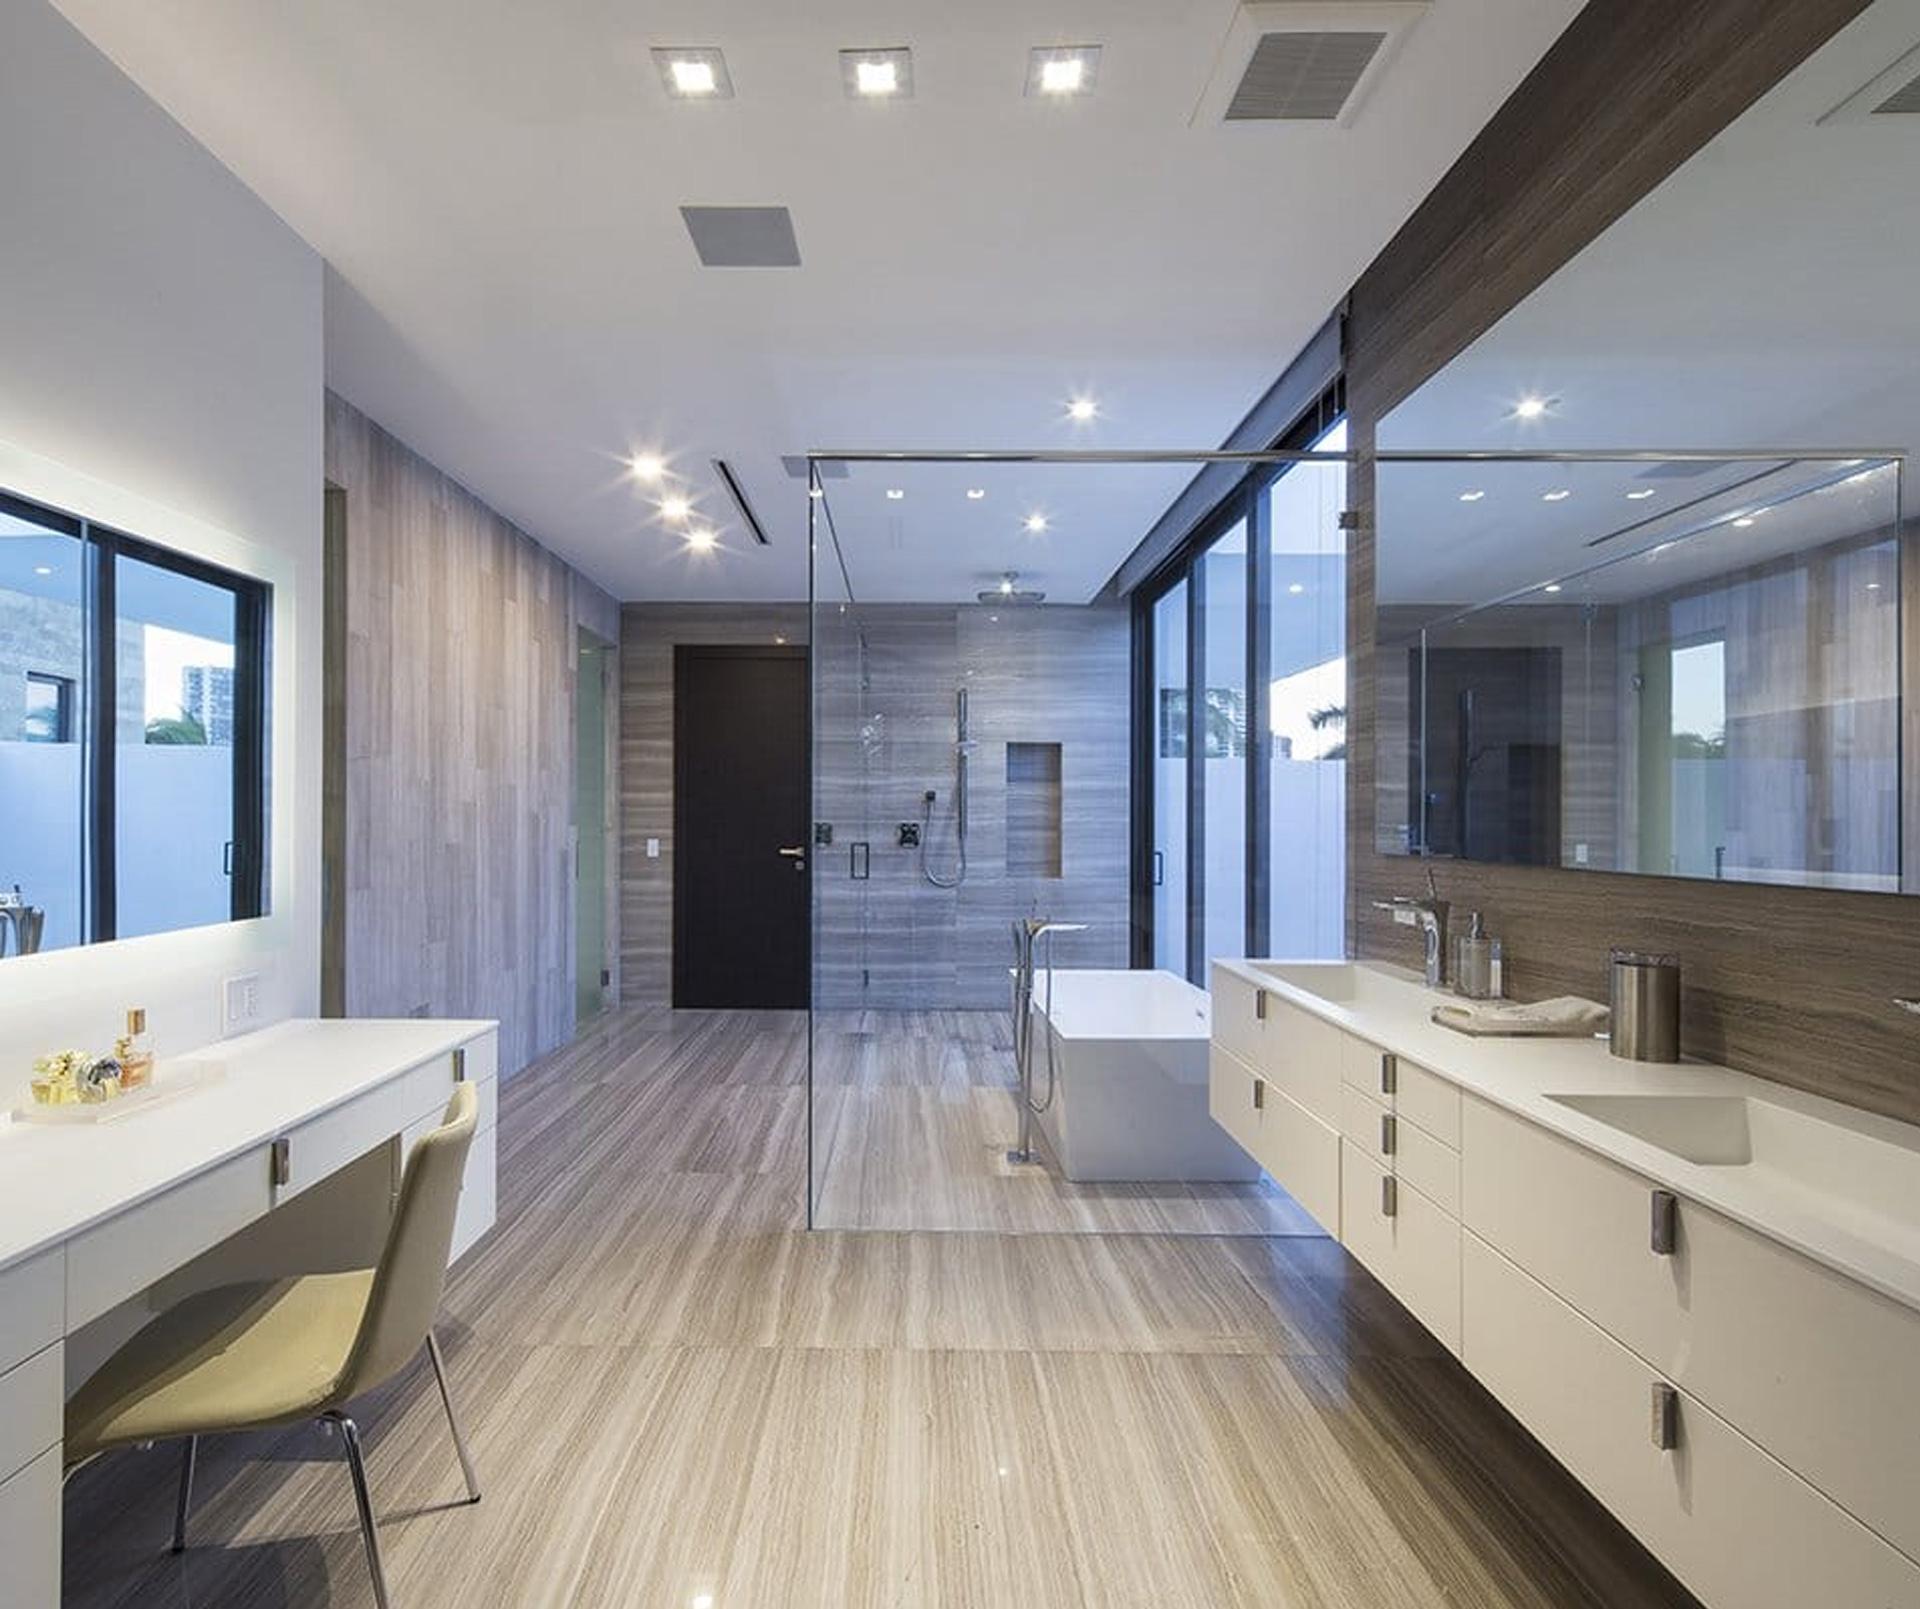 Bathroom View Interior Design project in 345 Golden Beach Drive, Florida